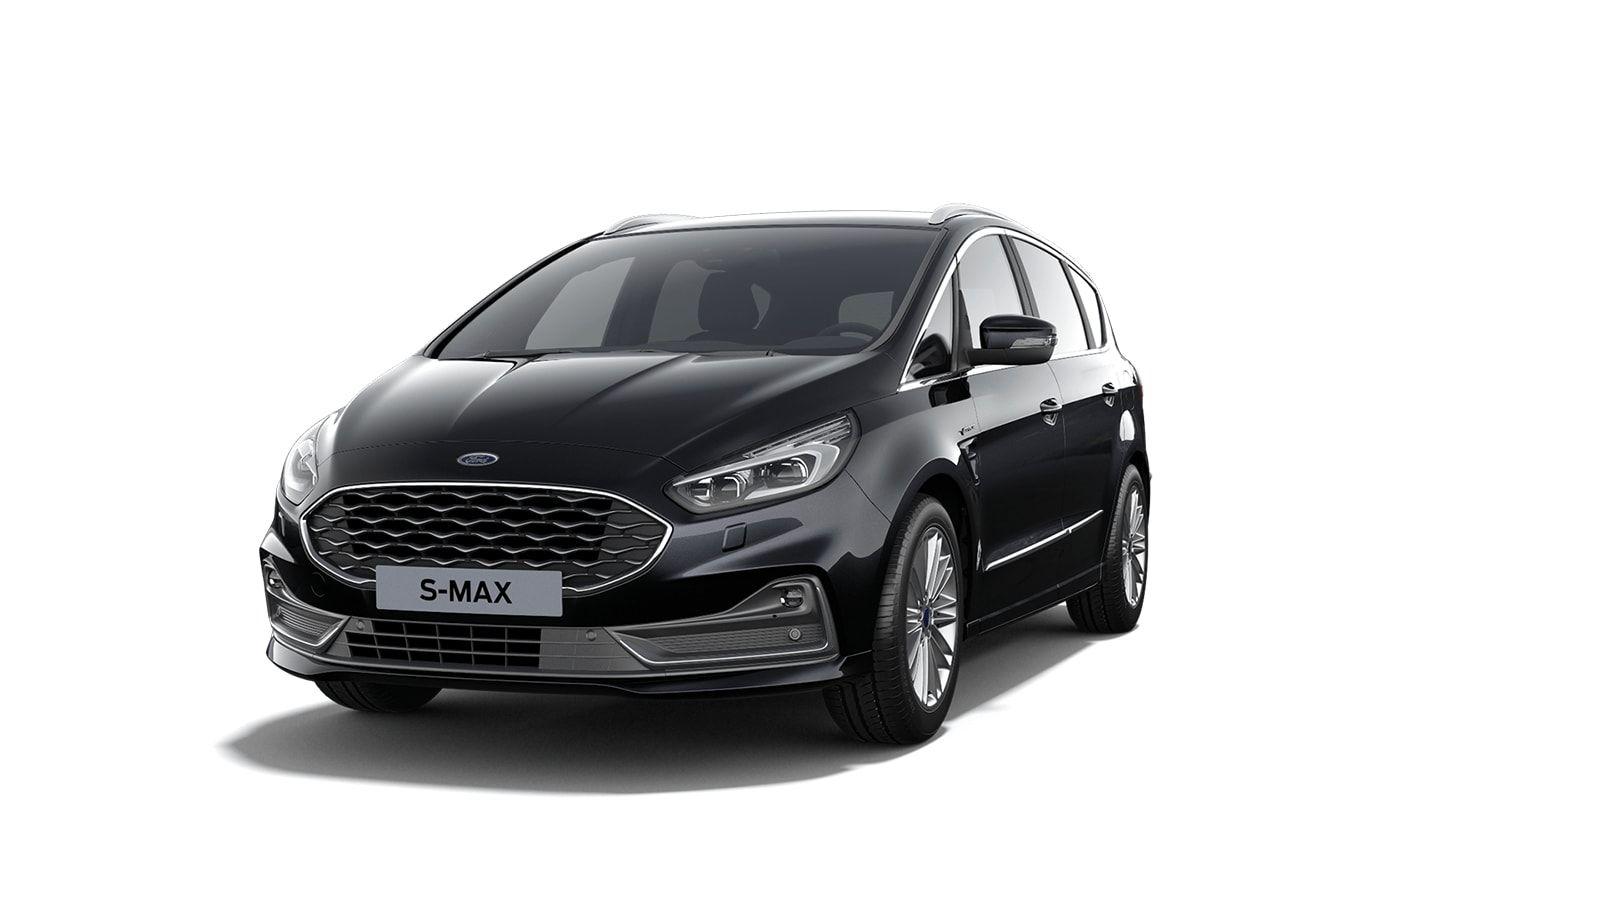 "Nieuw Ford S-max Vignale 2.0 TDCi 190pk / 139kW Auto-Start-Stop A8 - 5d 9I6 - ""Agate Black Vignale"" metaalkleur 1"